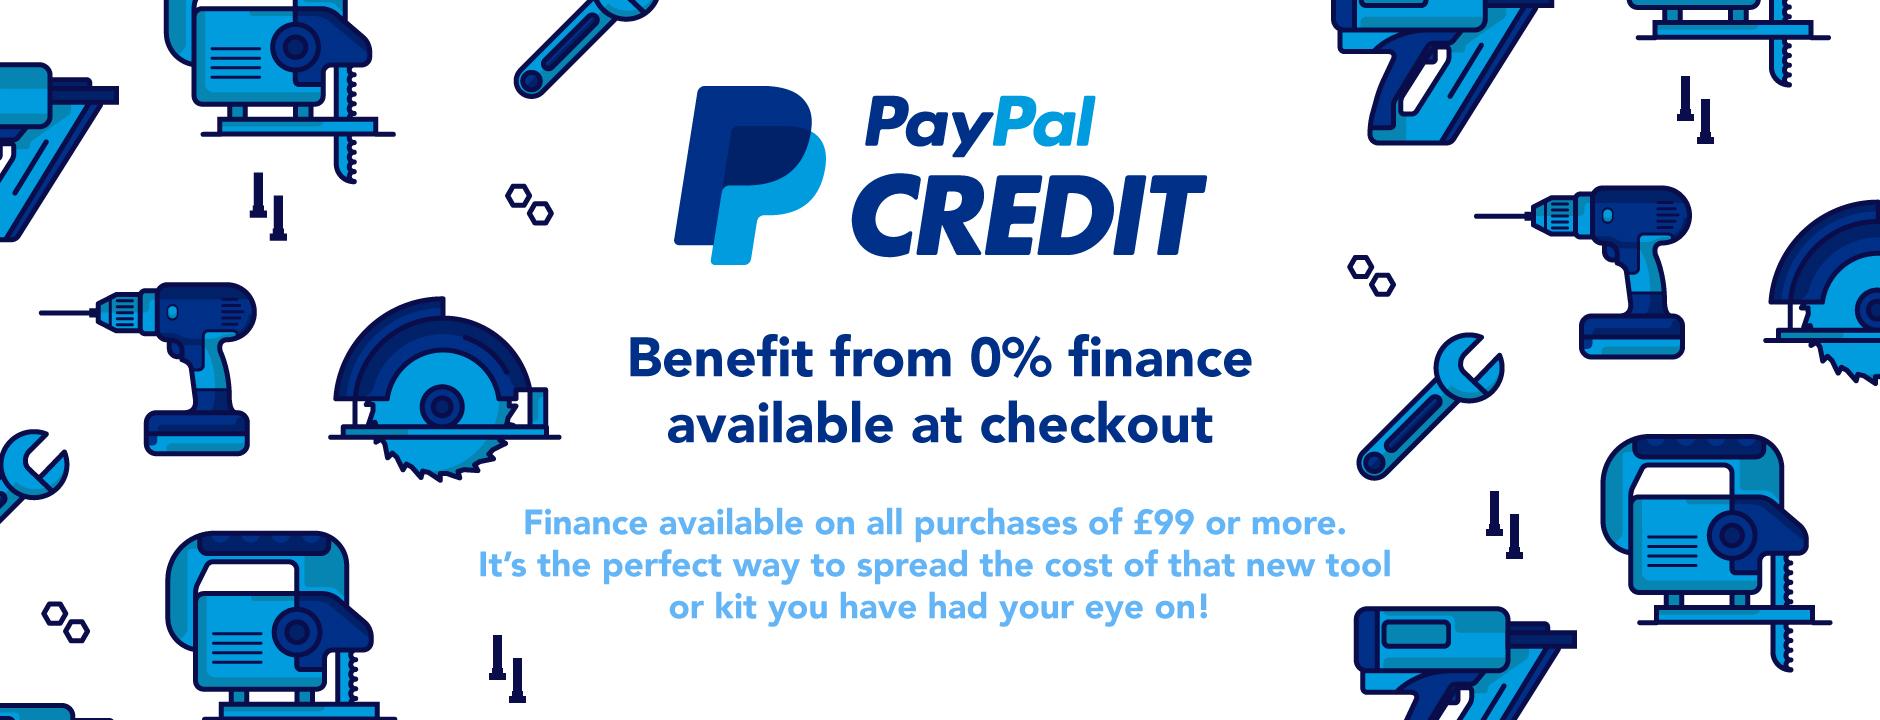 ahc-paypal-credit-banner-crisp.jpg